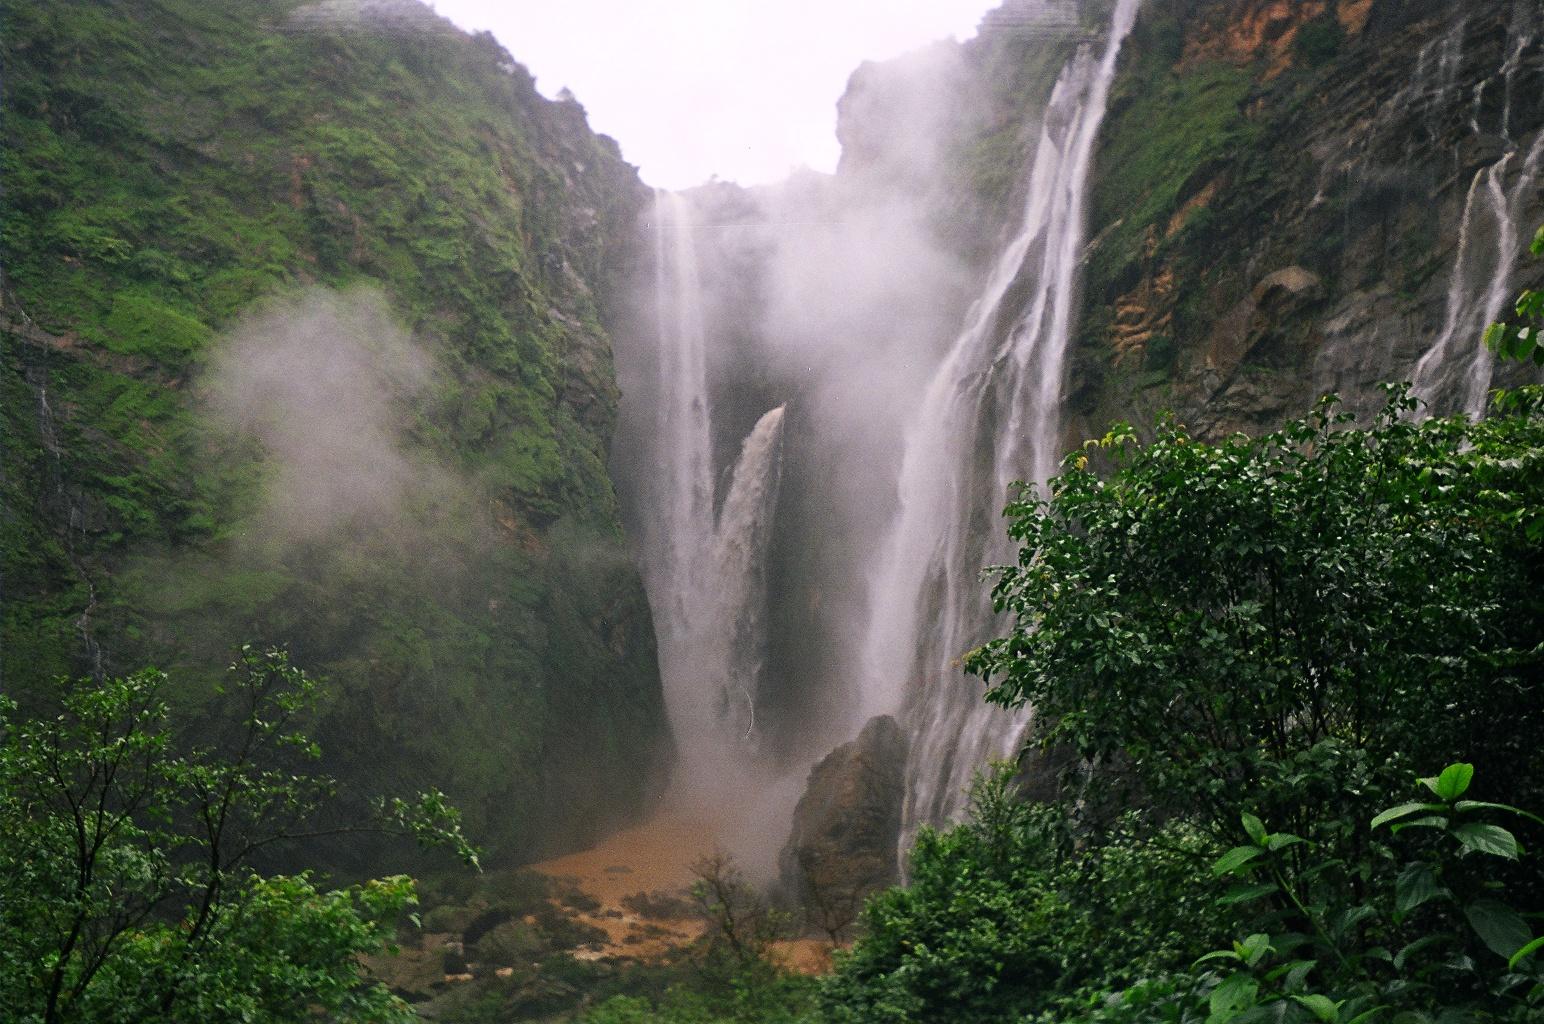 Image credit: http://upload.wikimedia.org/wikipedia/commons/7/74/JogFallsFromBelow1.JPG